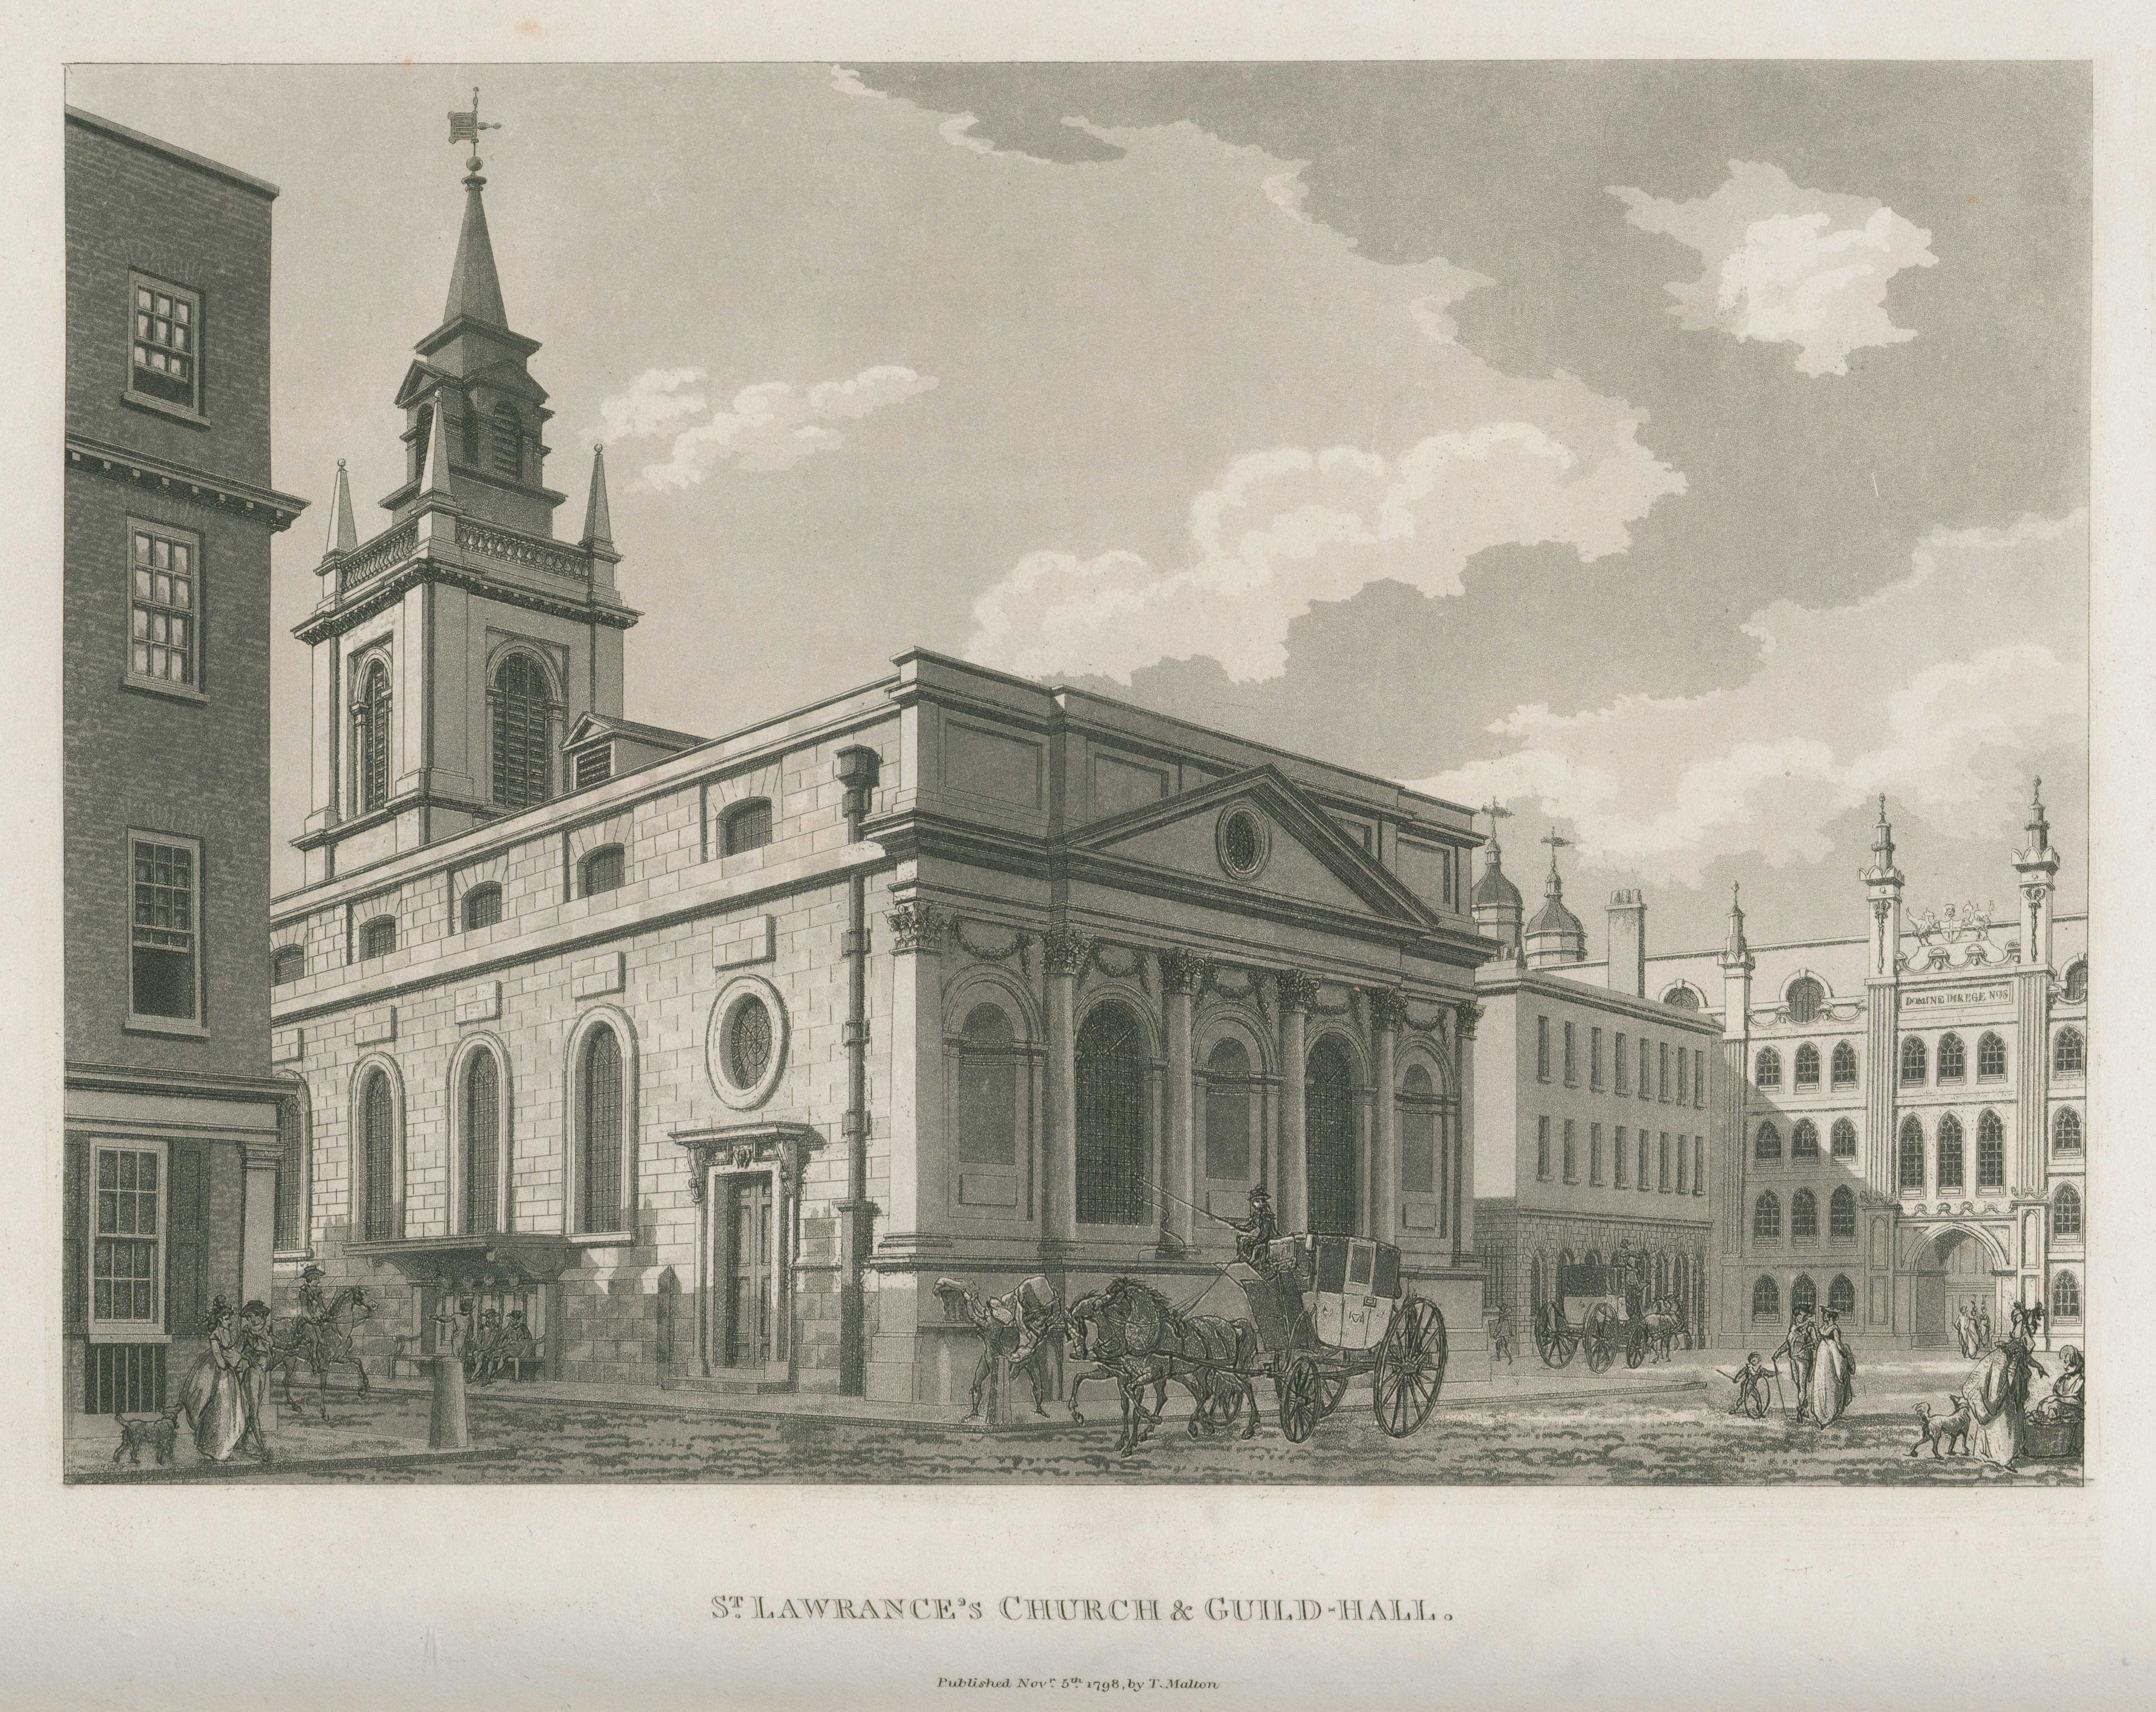 058 - Malton - St Lawrance's Church & Guild-Hall